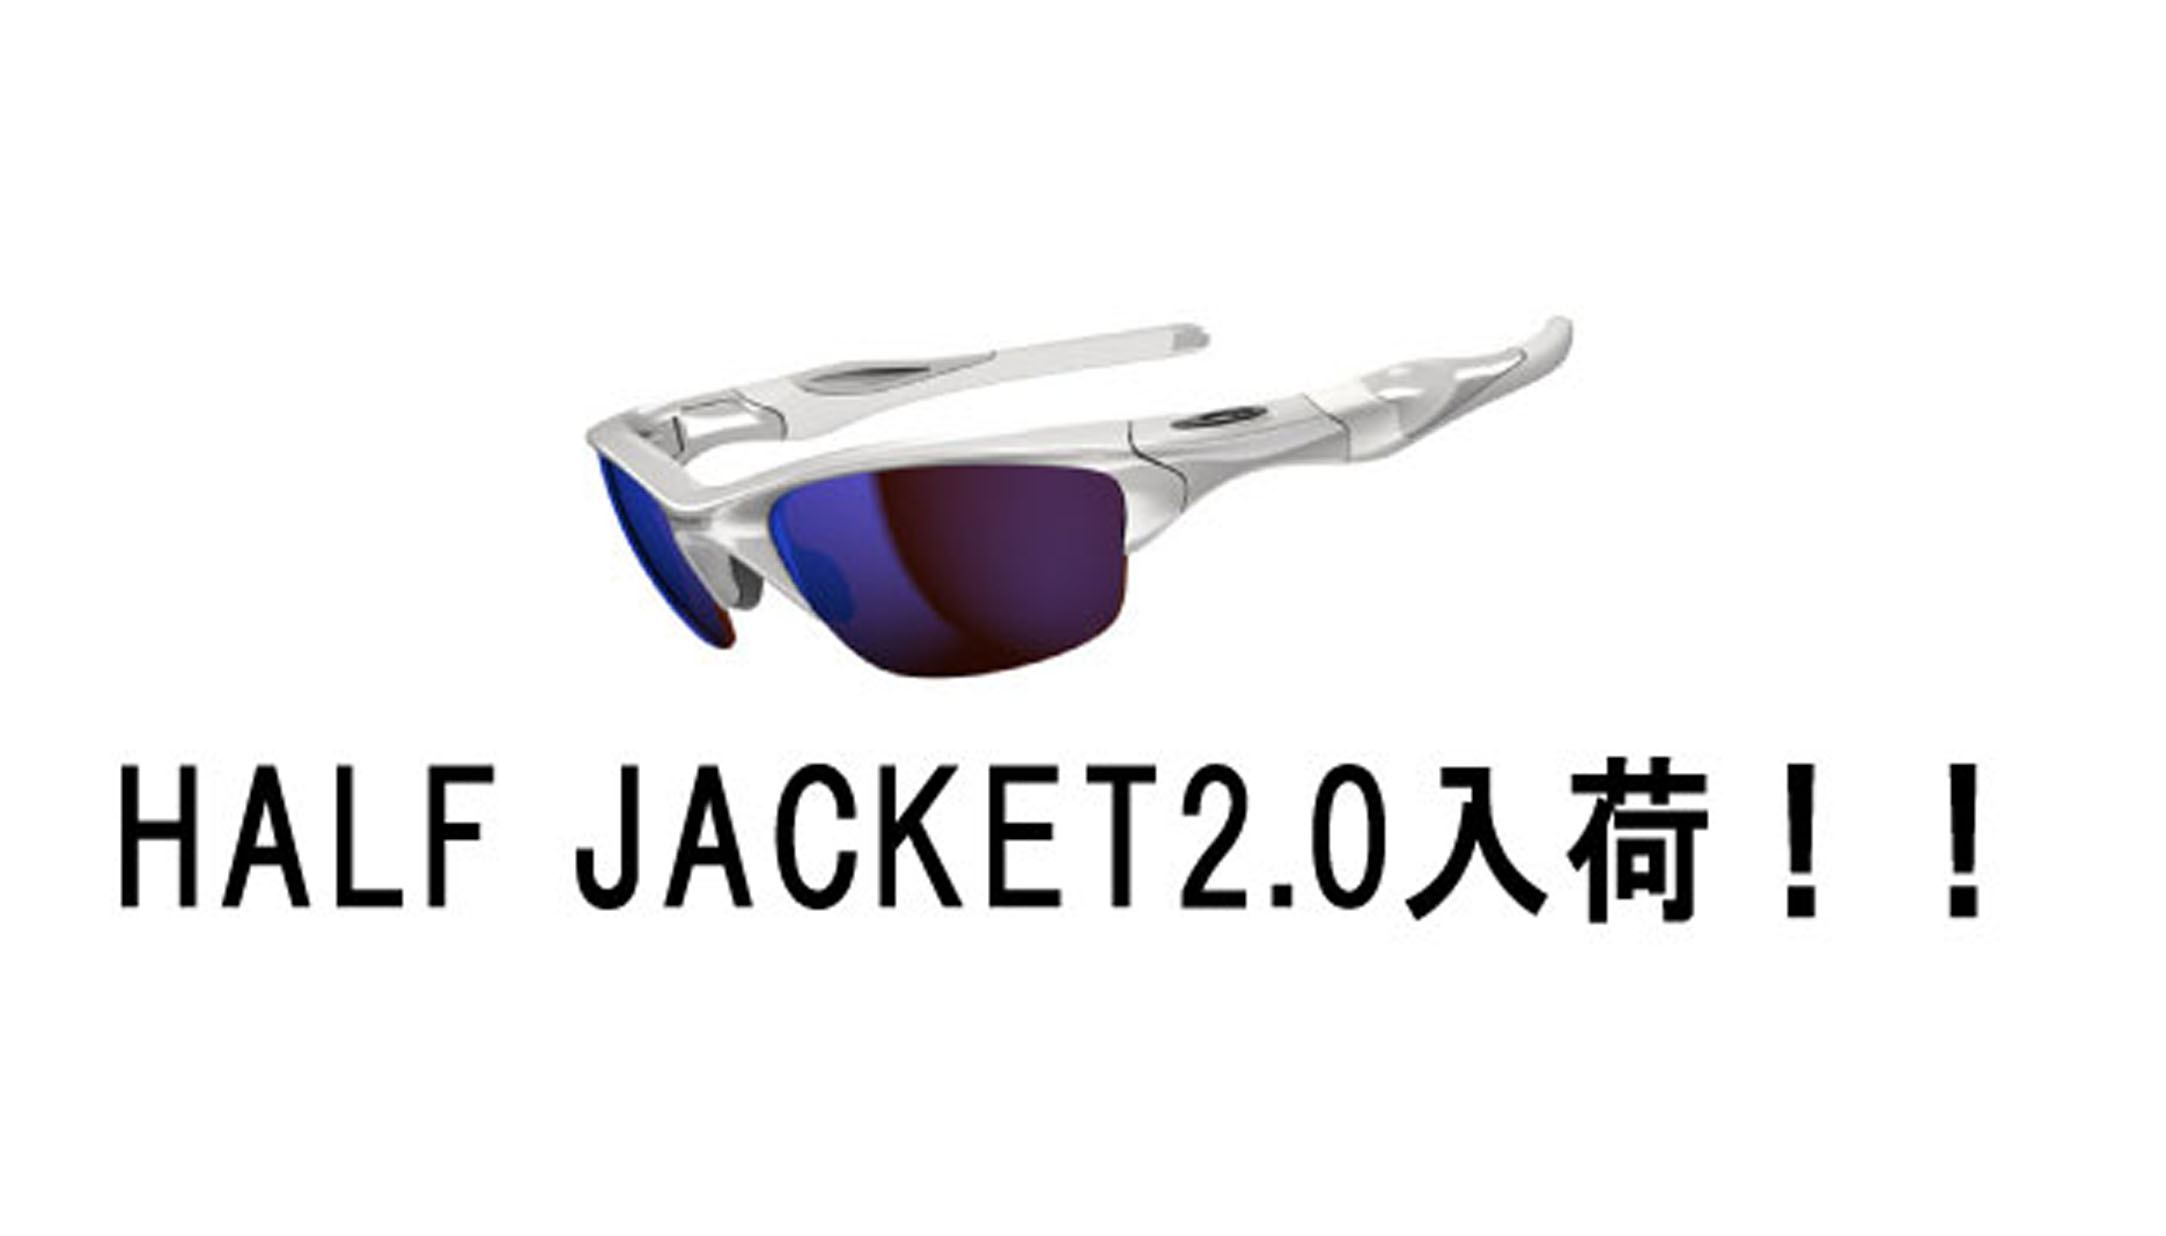 HALF JACKET2.0(ハーフ ジャケット2.0)入荷!!